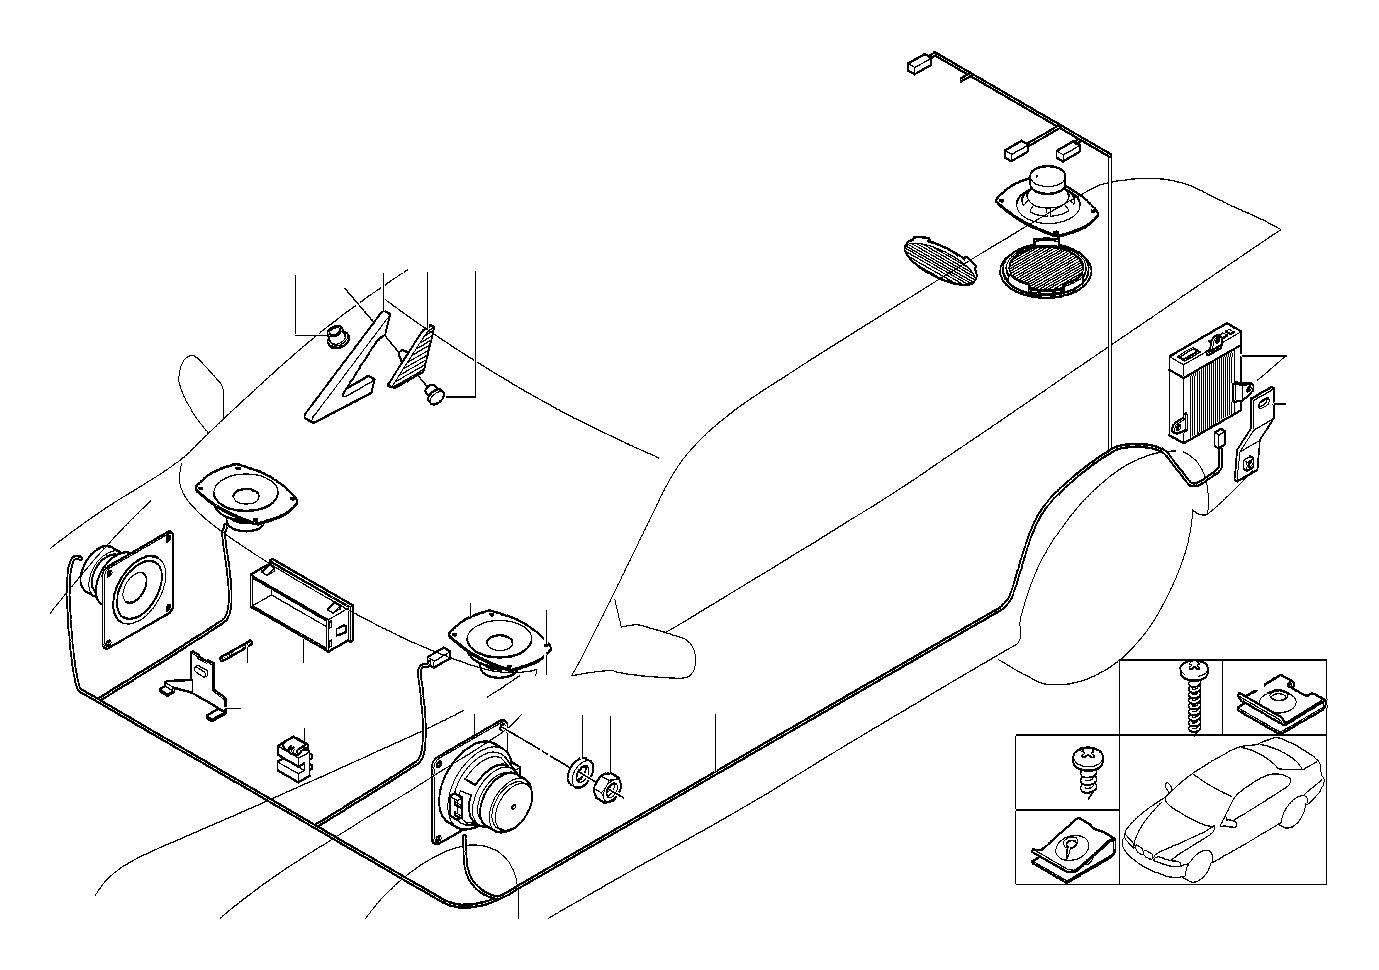 BMW 735iL Loudspeaker. 4OHM 20/40 WATT. System, Single